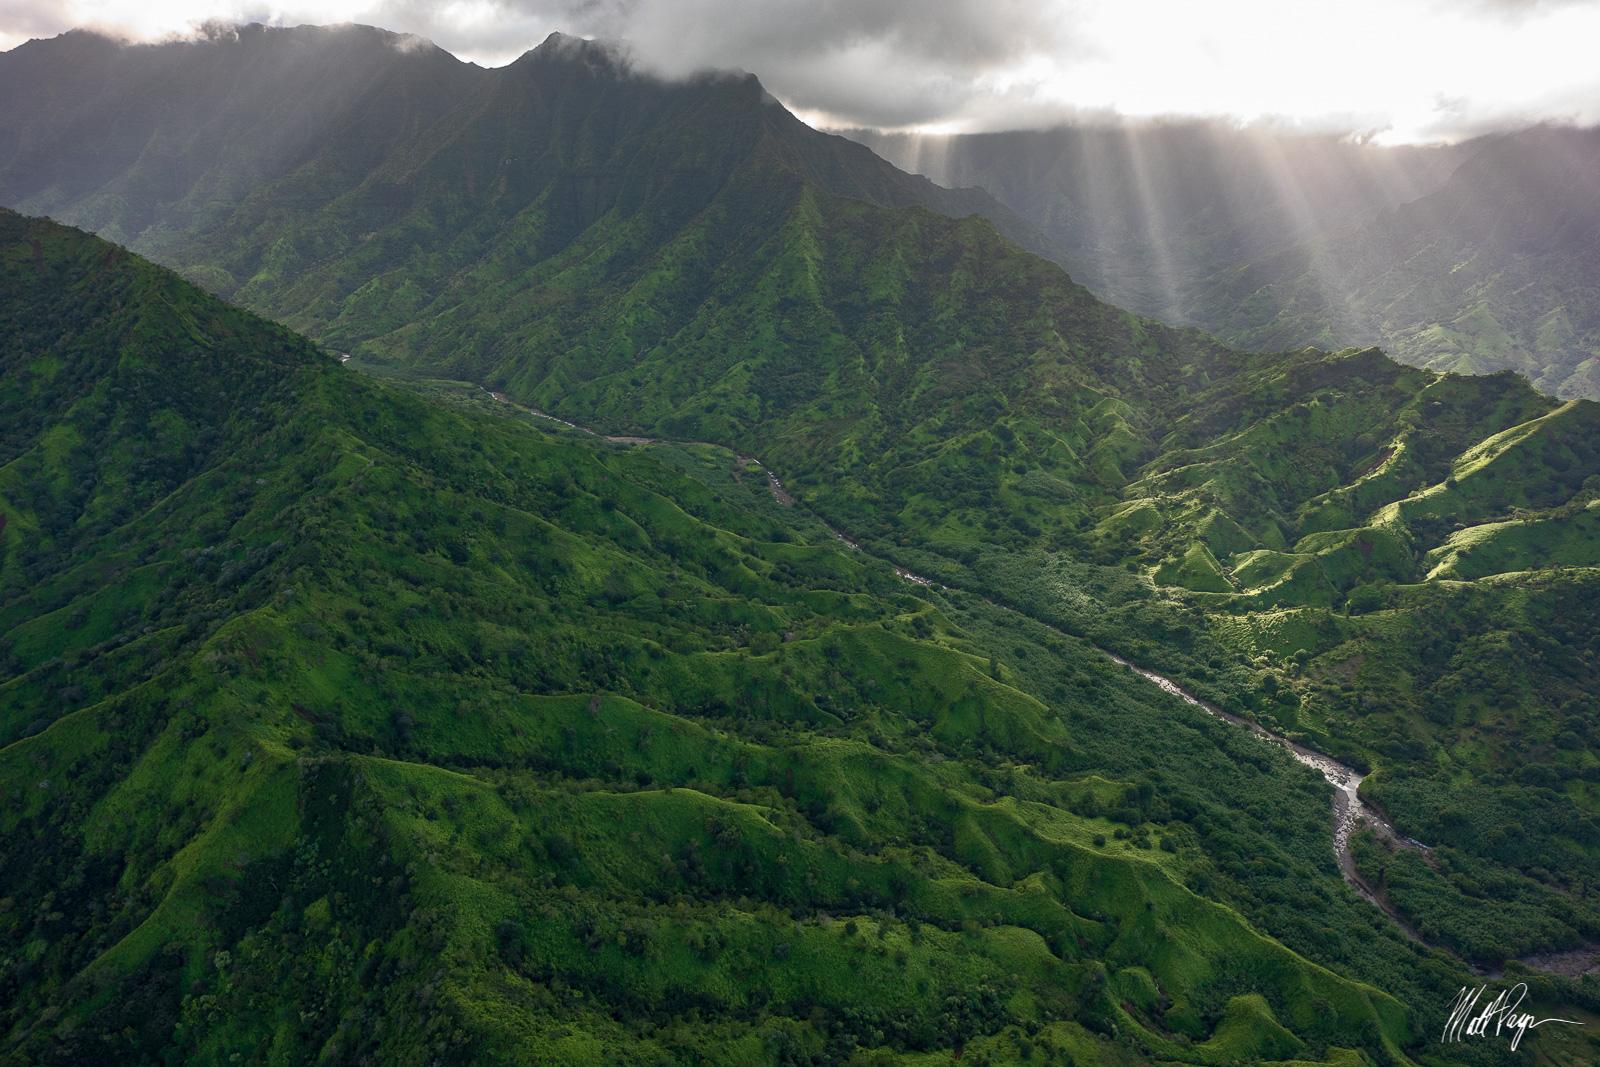 Clouds, Crepuscular rays, Forest, Hawaii, Kauai, lush, River, beautiful, aerial, photo